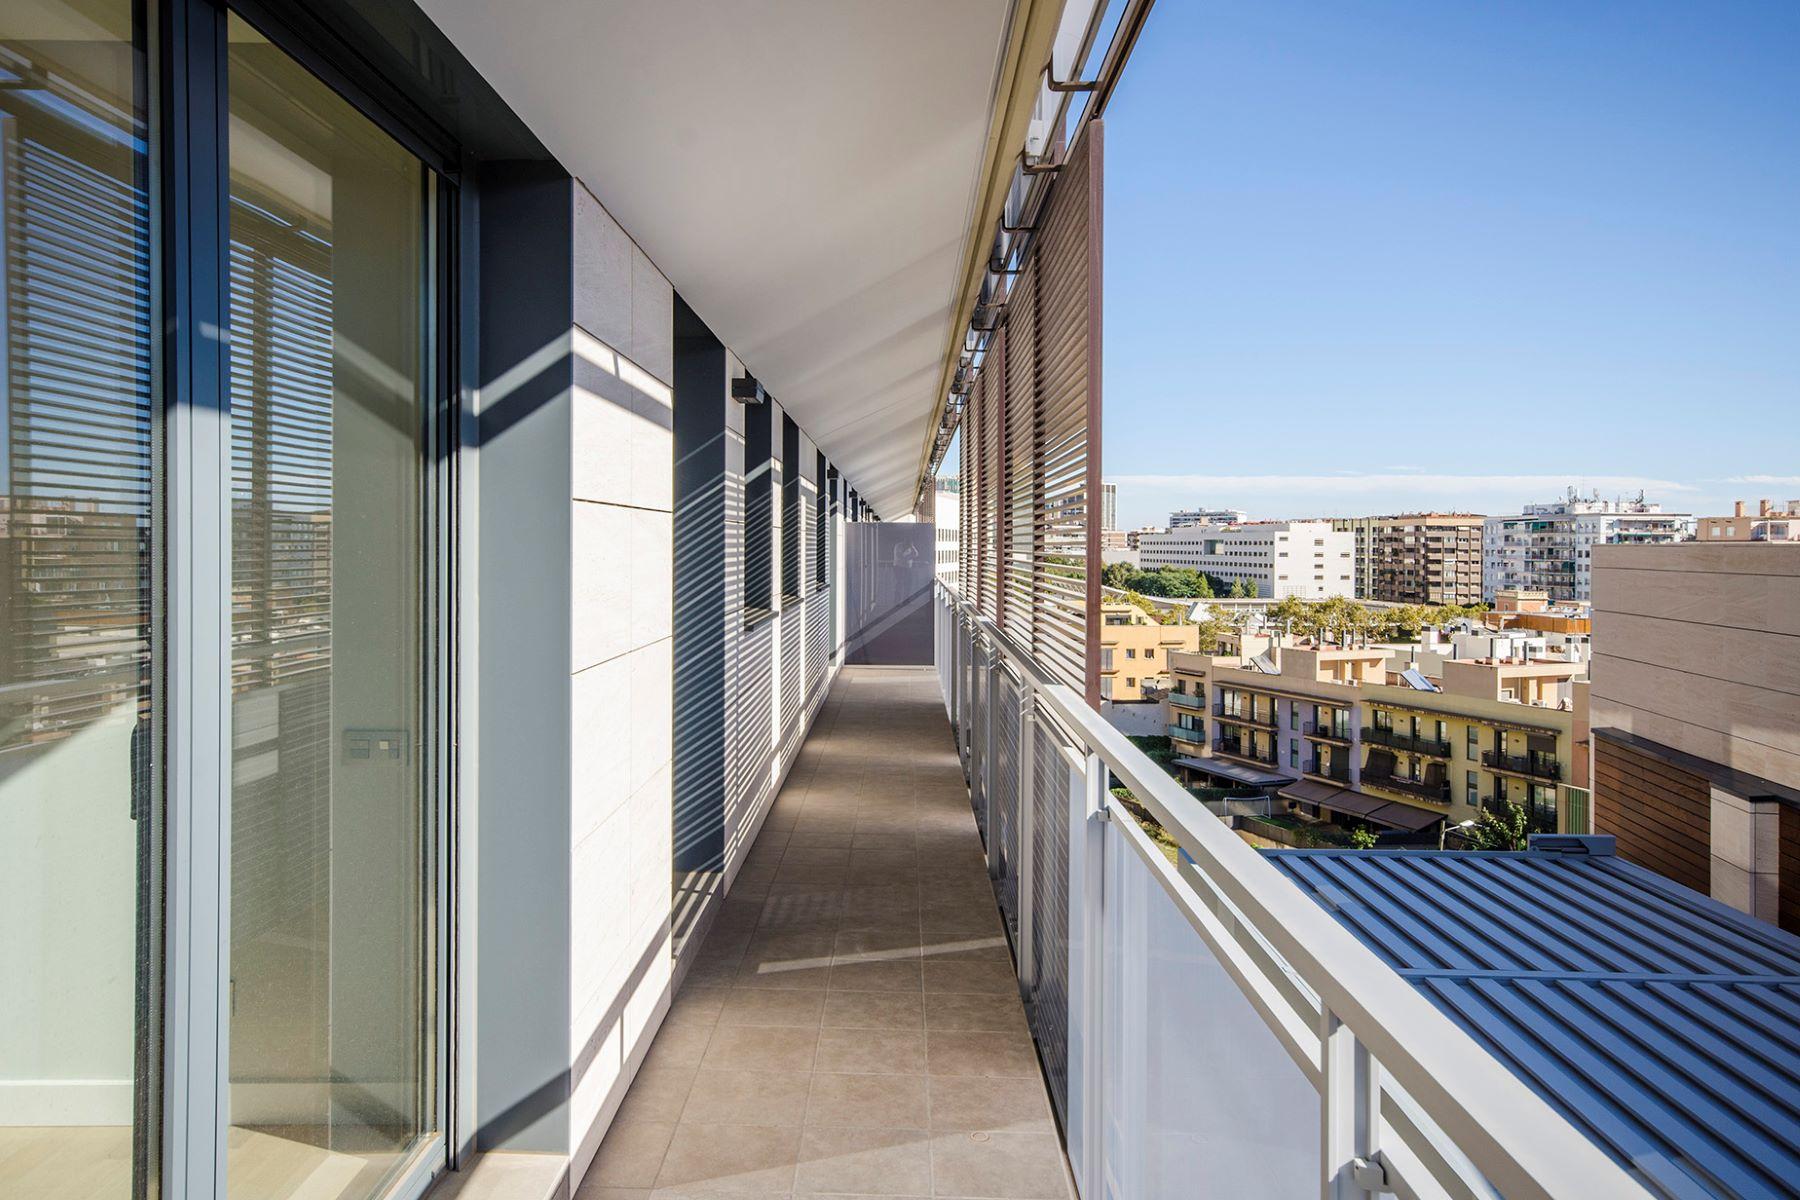 Apartment for Sale at New development near Diagonal Avenue Barcelona City, Barcelona, 08034 Spain